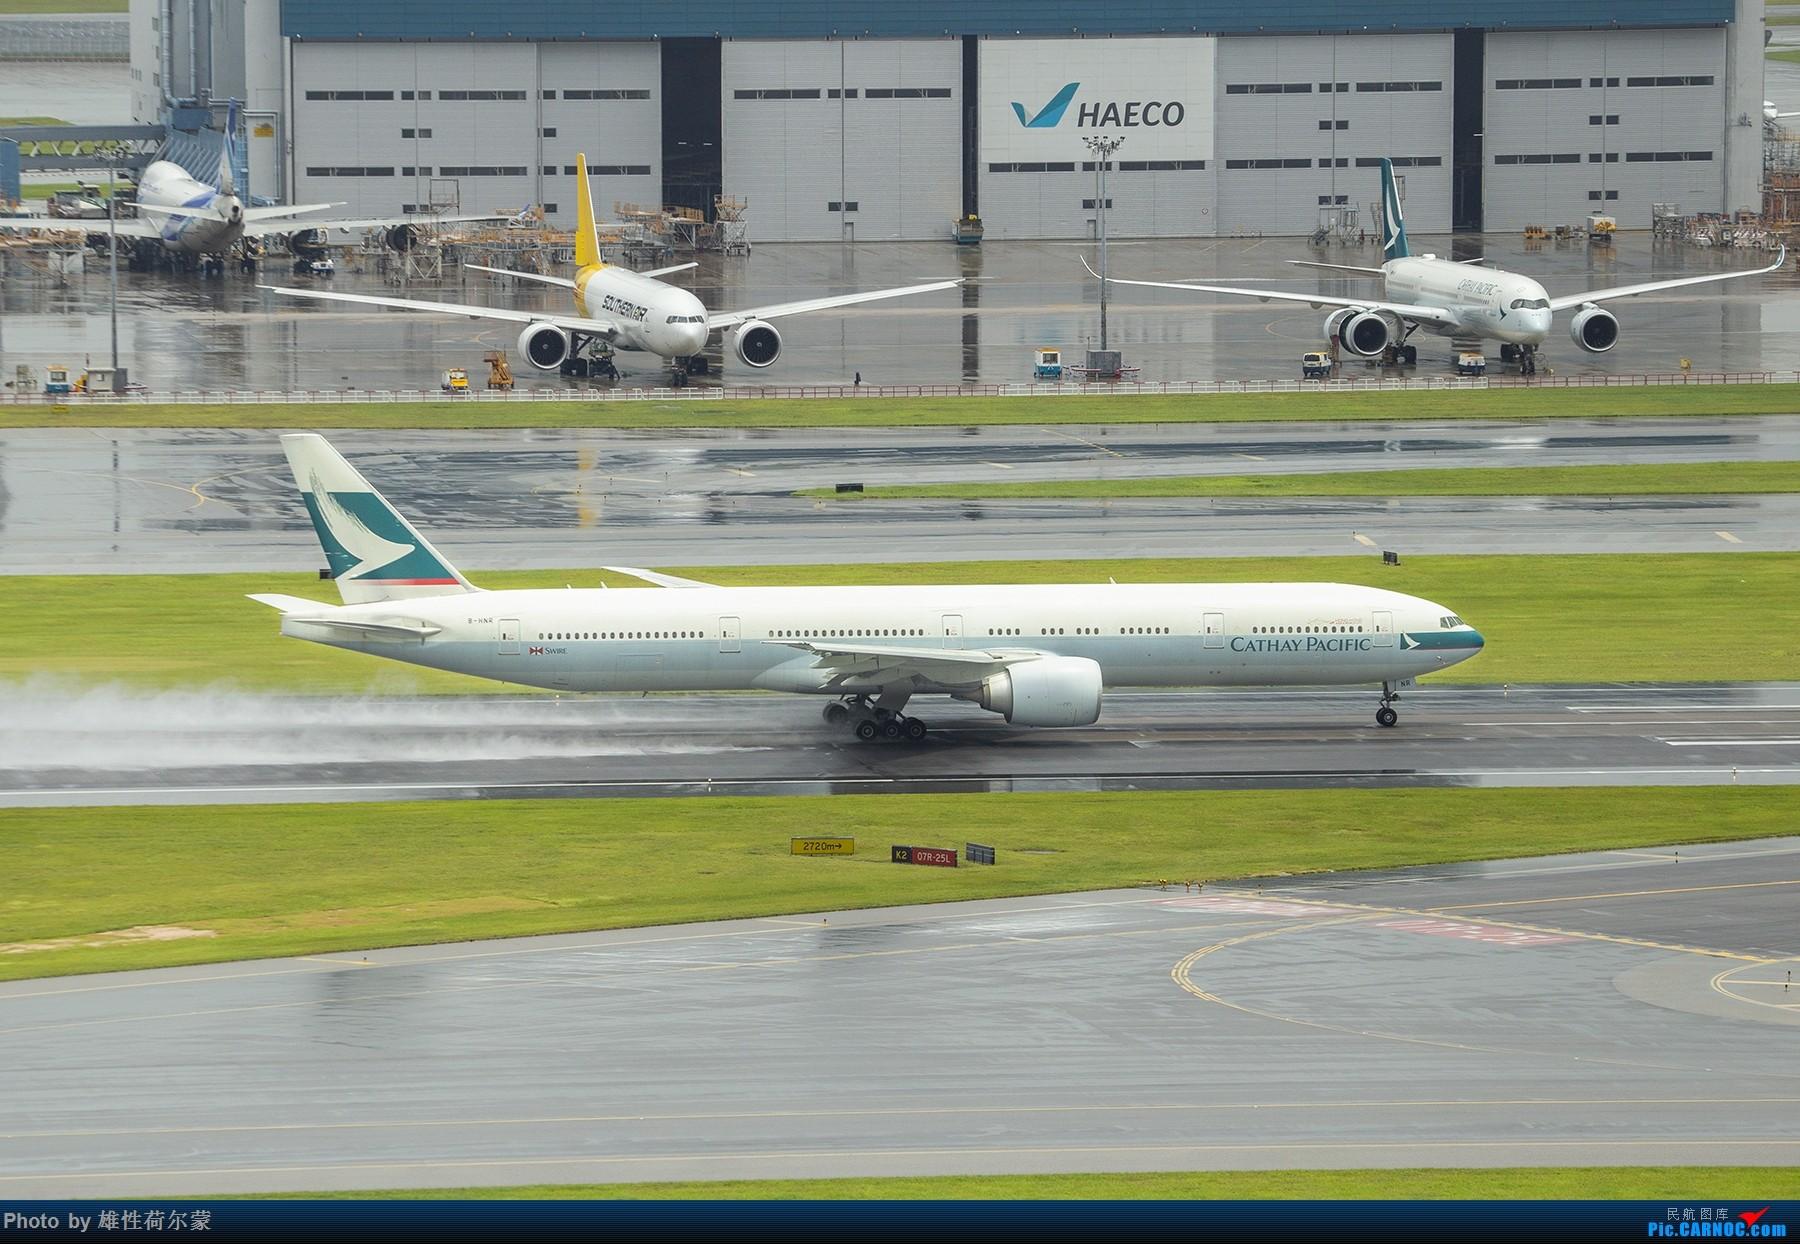 Re:[原创]沙螺湾拍飞机起飞(香港) BOEING 777-300ER B-HNR 中国香港国际机场